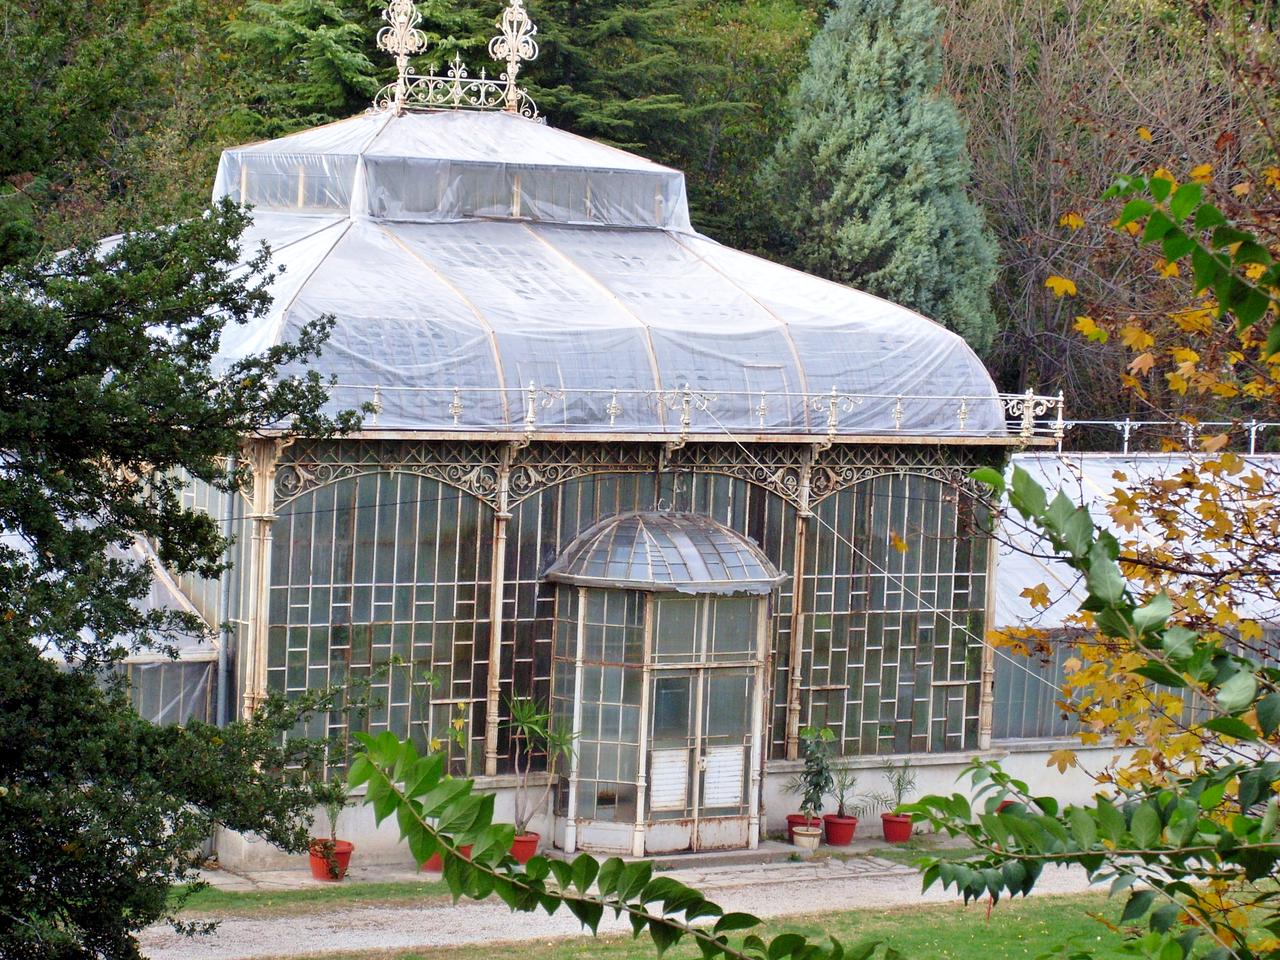 Jevremovac Botanical Garden by Orjen Wikimedia Commons